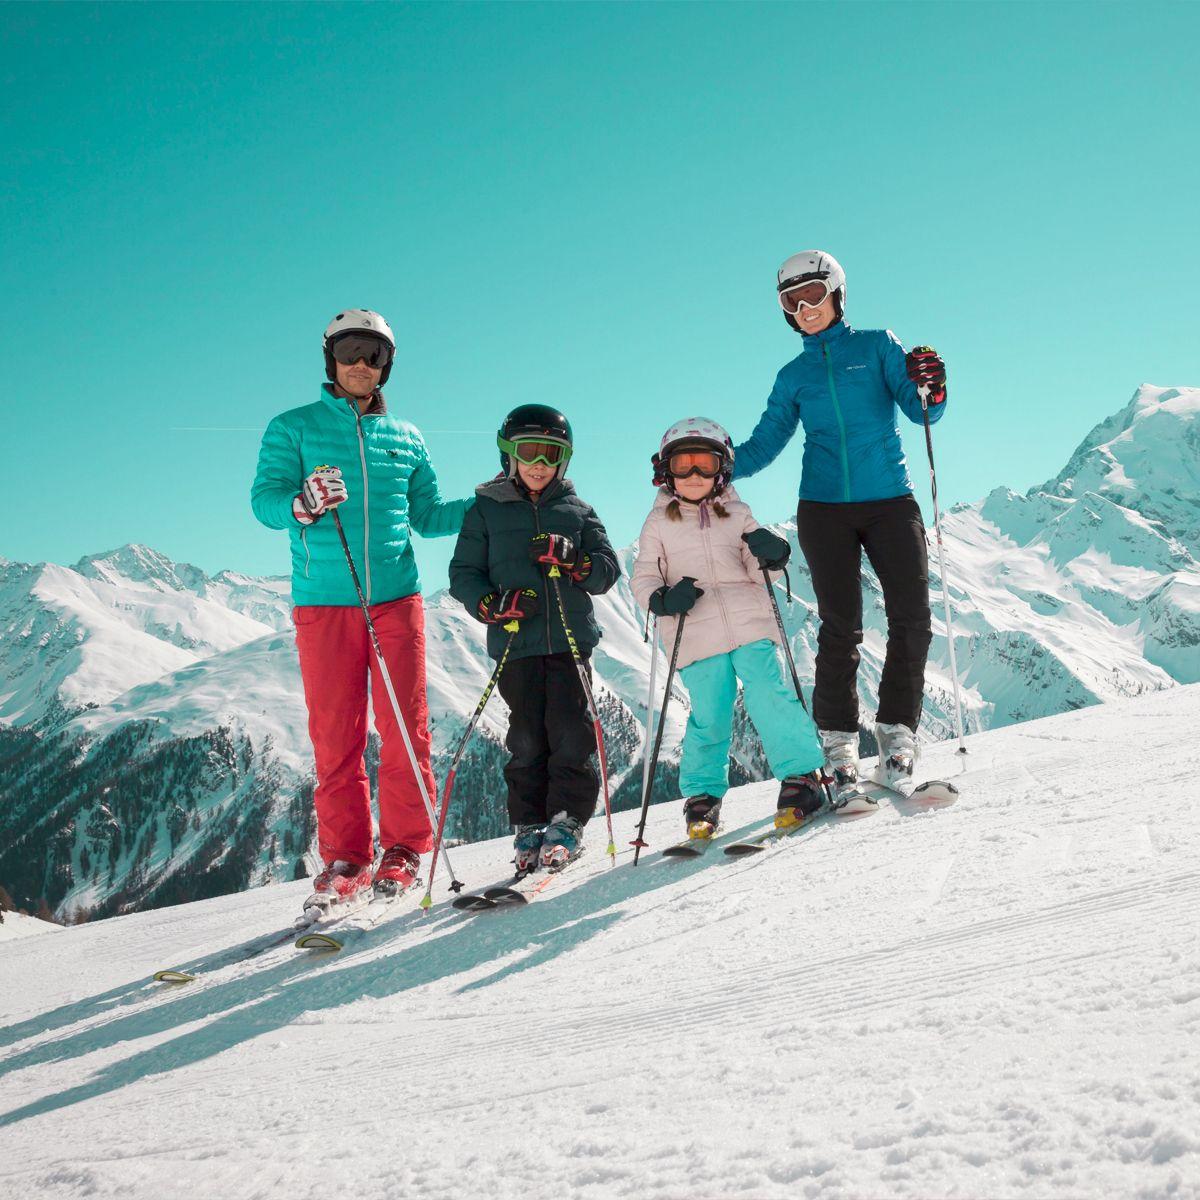 Skimax_Pujcovna_lyzi_snowboardu_bezek_celosezonni_zapujcky_1